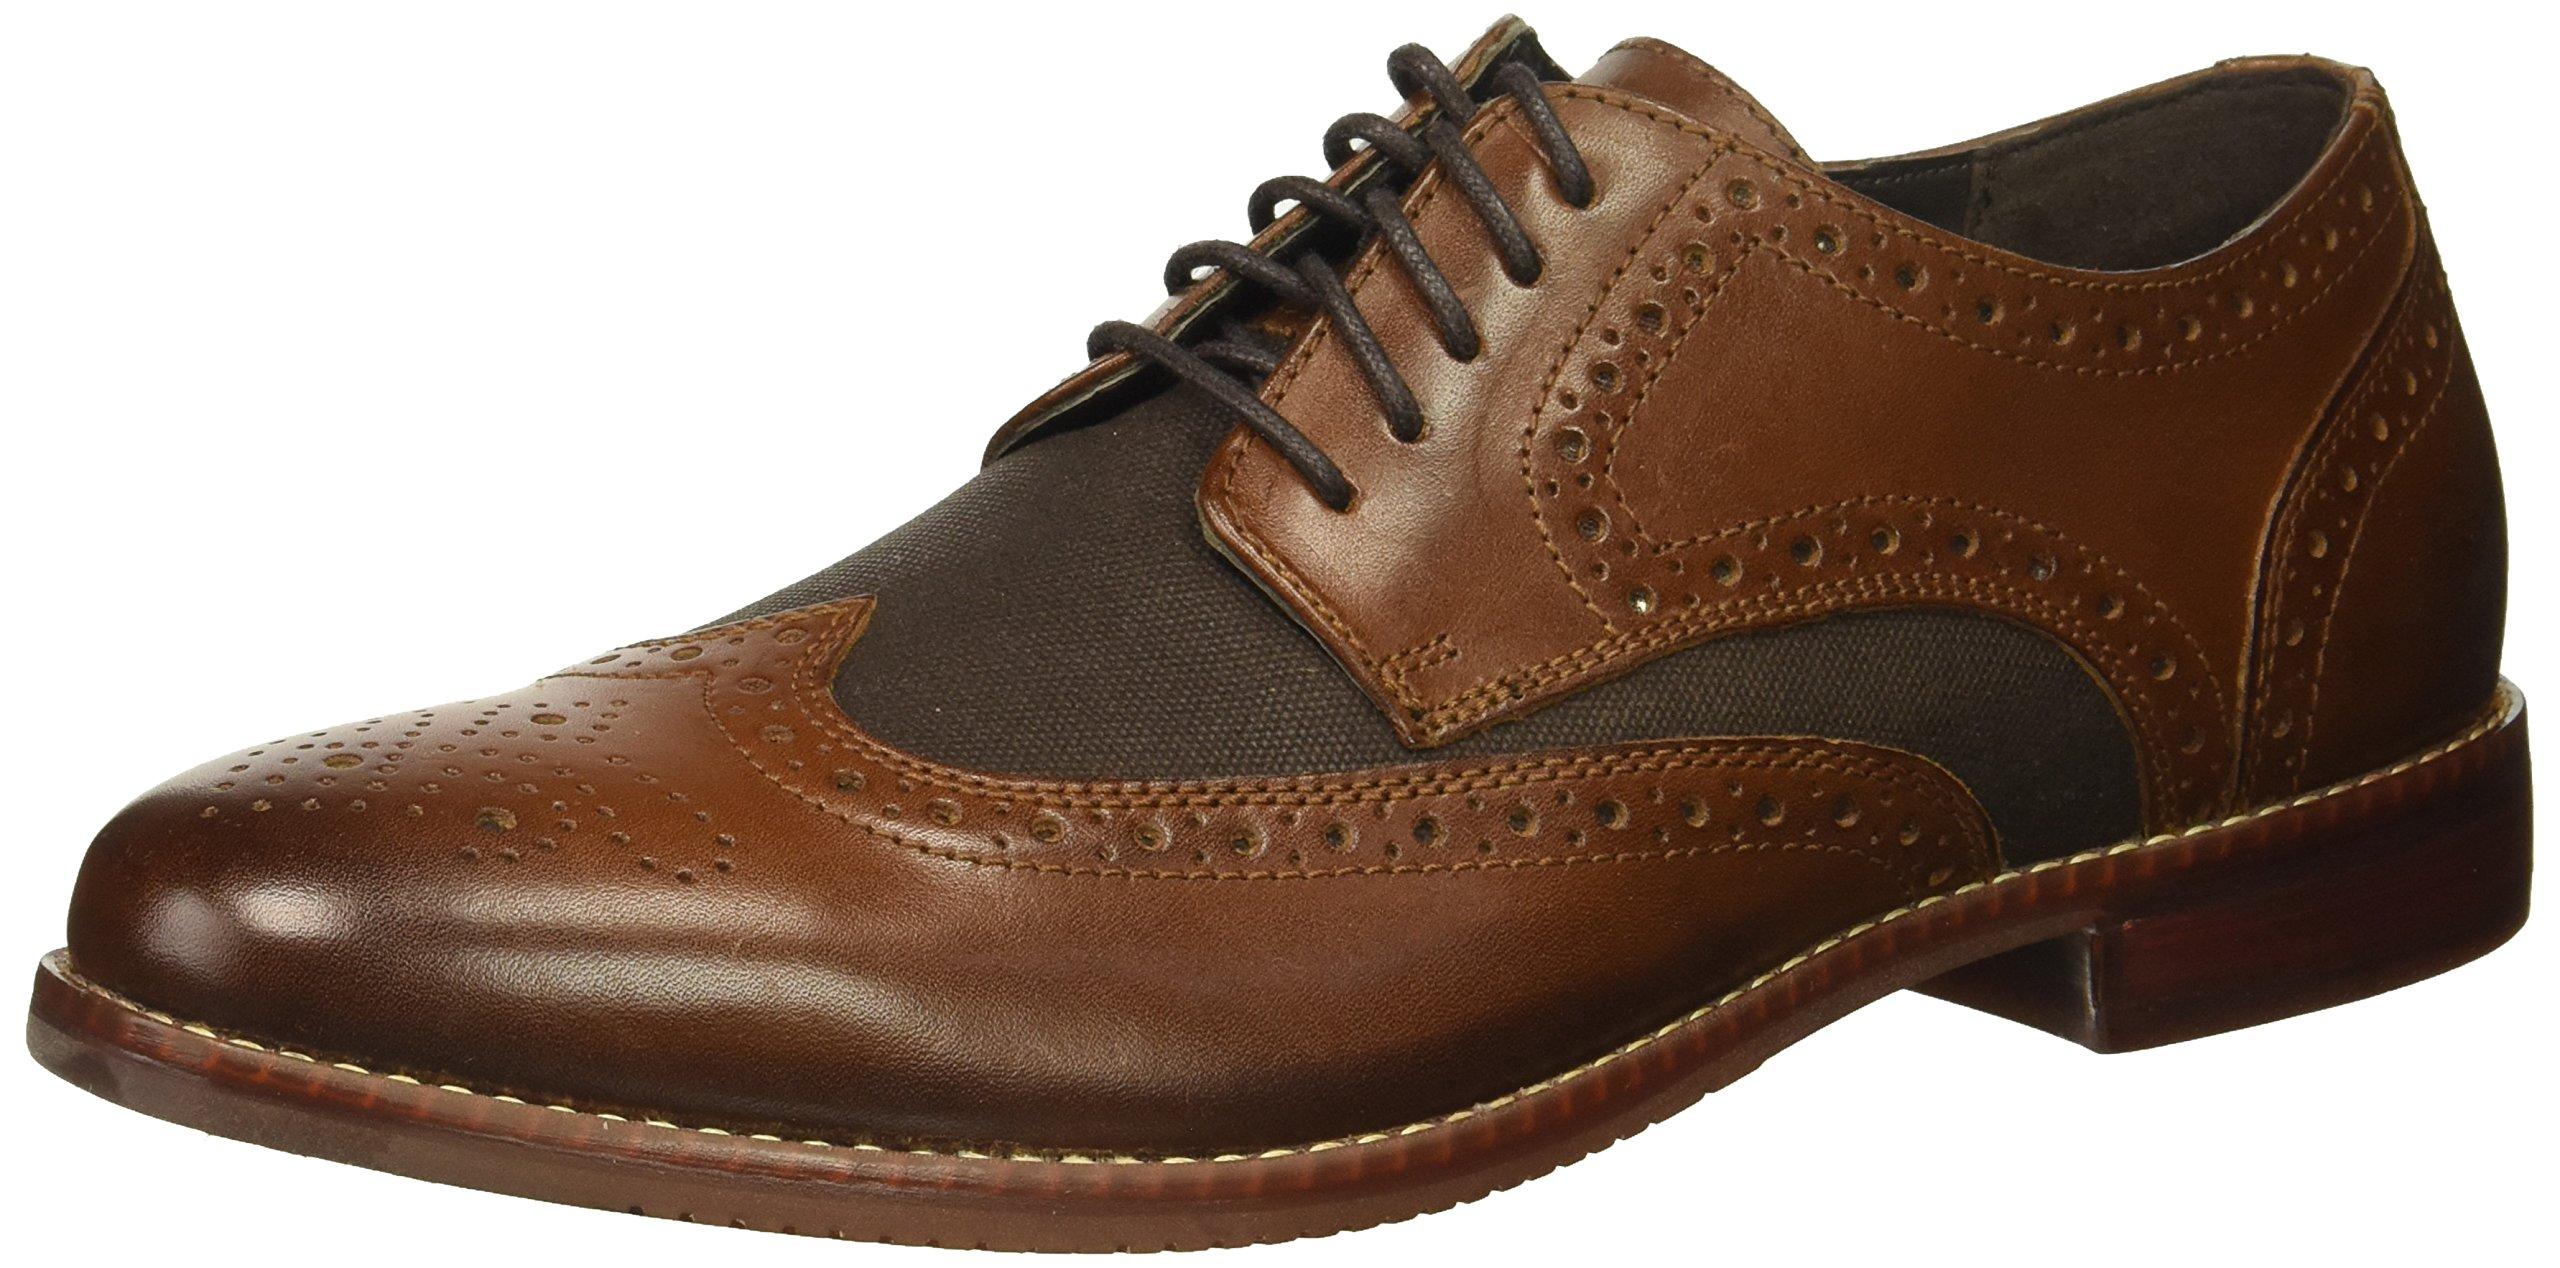 Rockport Men's Style Purpose Wingtip Shoe, dark brown leather, 8 M US